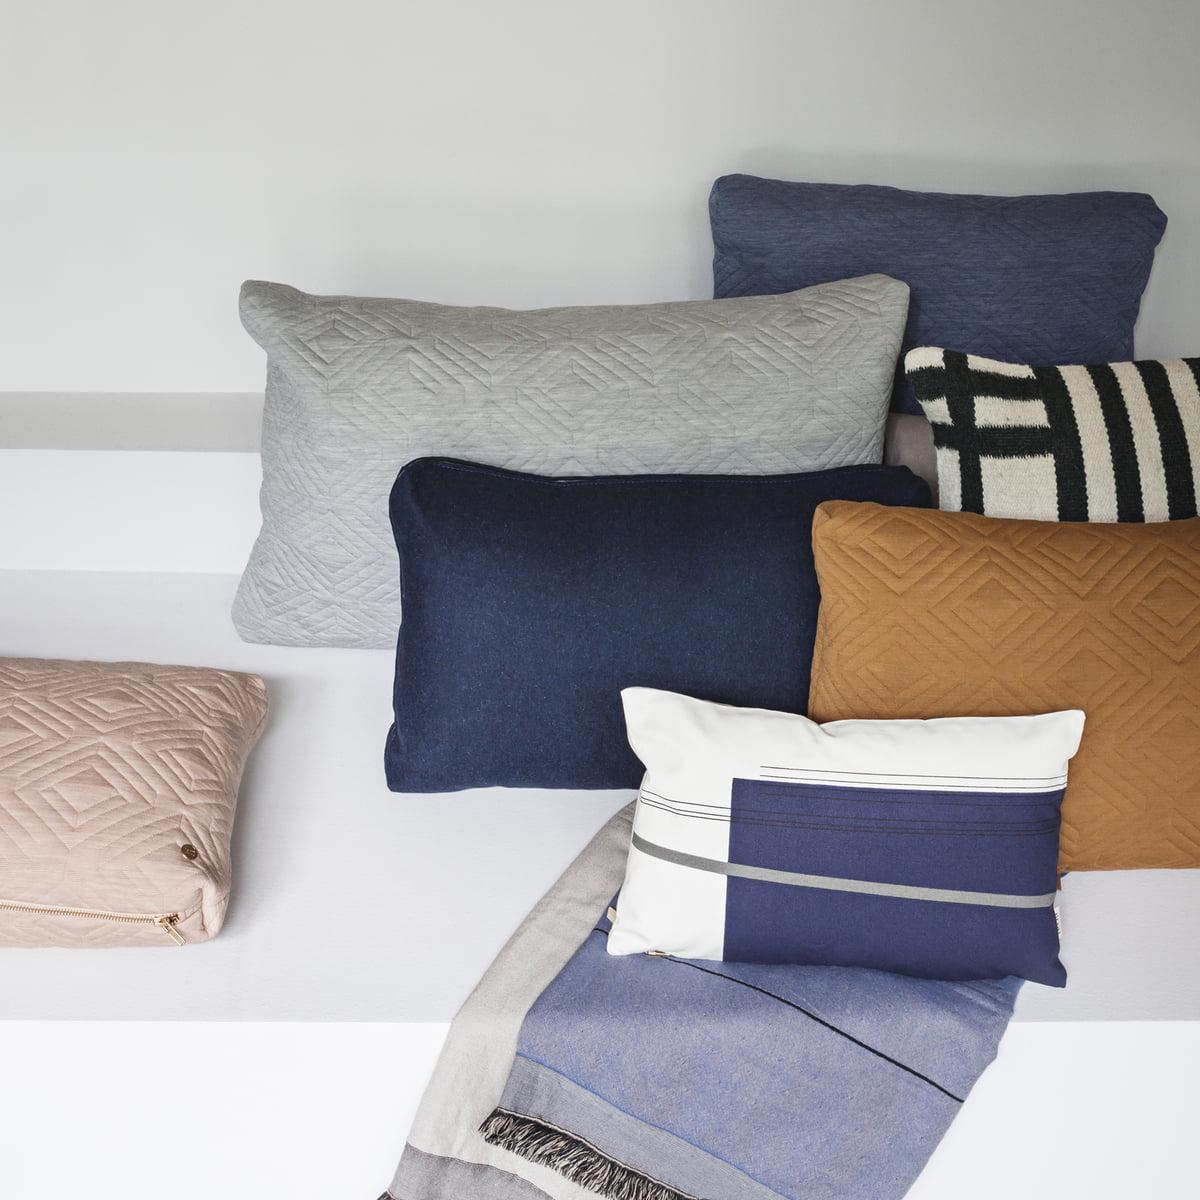 colour block kissen small ferm living. Black Bedroom Furniture Sets. Home Design Ideas